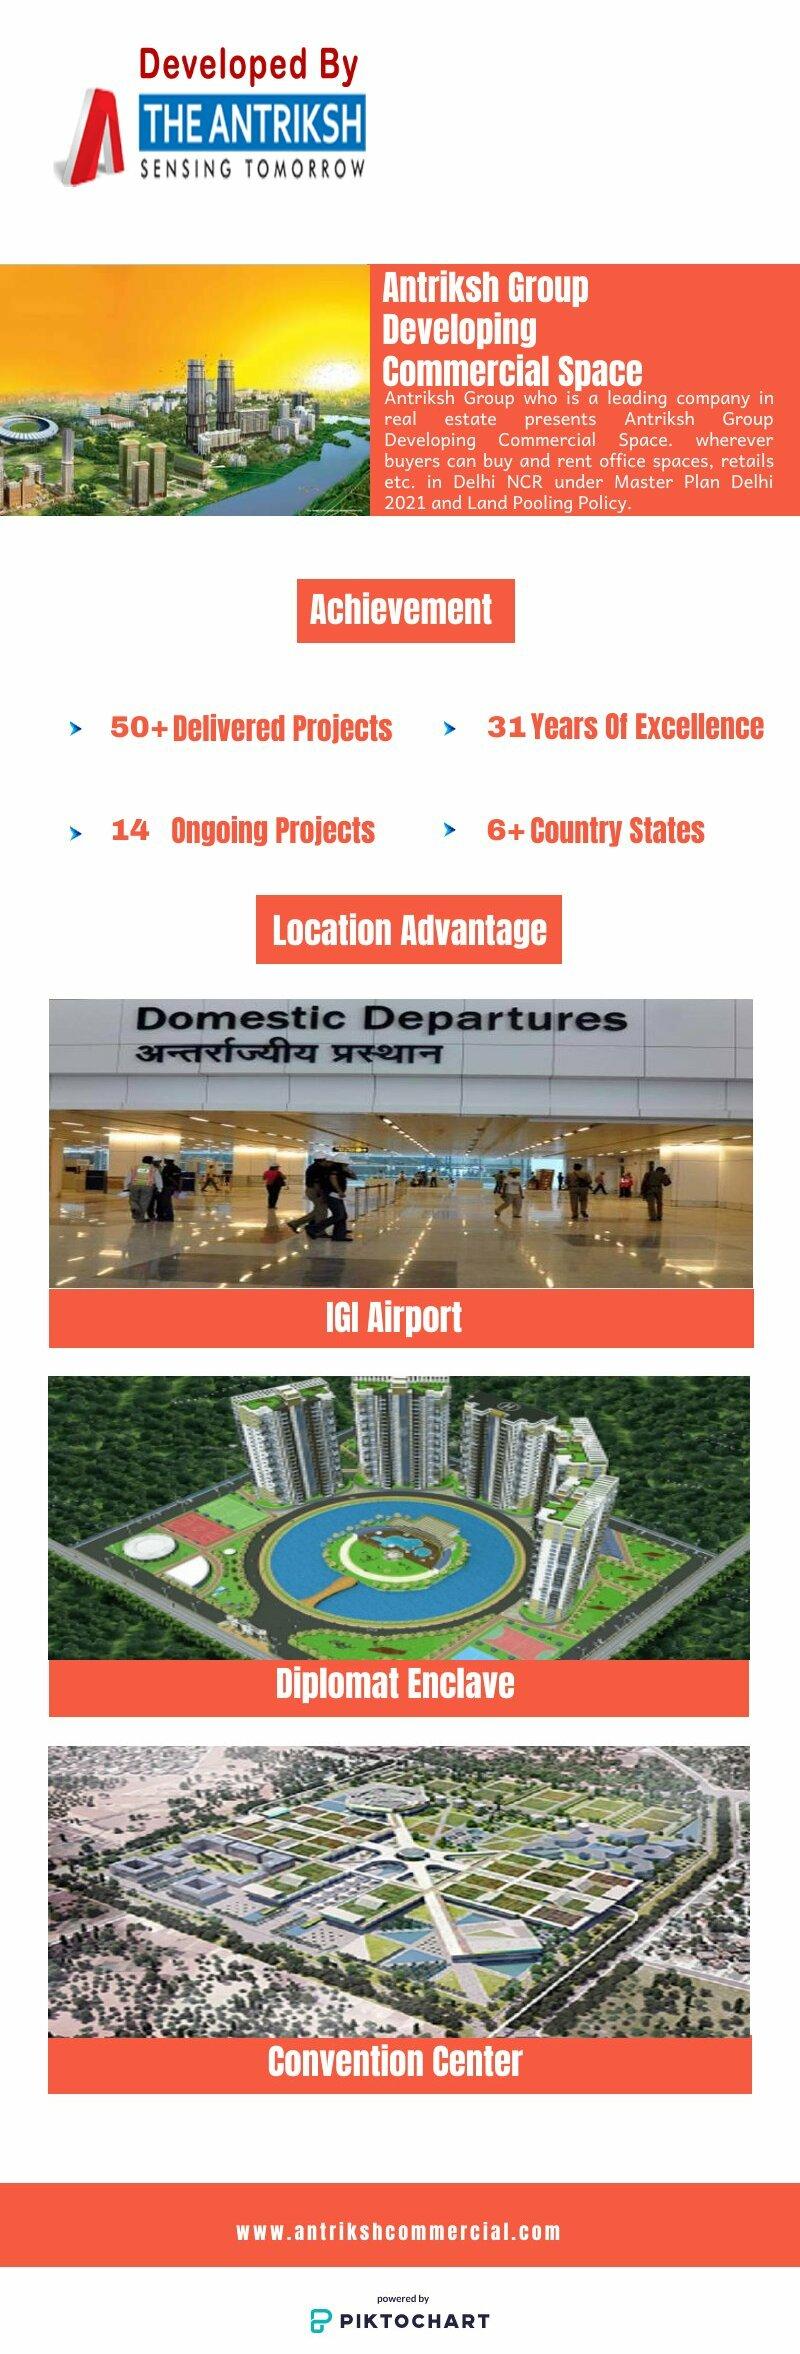 New commercial property for sale in Dwarka L Zone Delhi